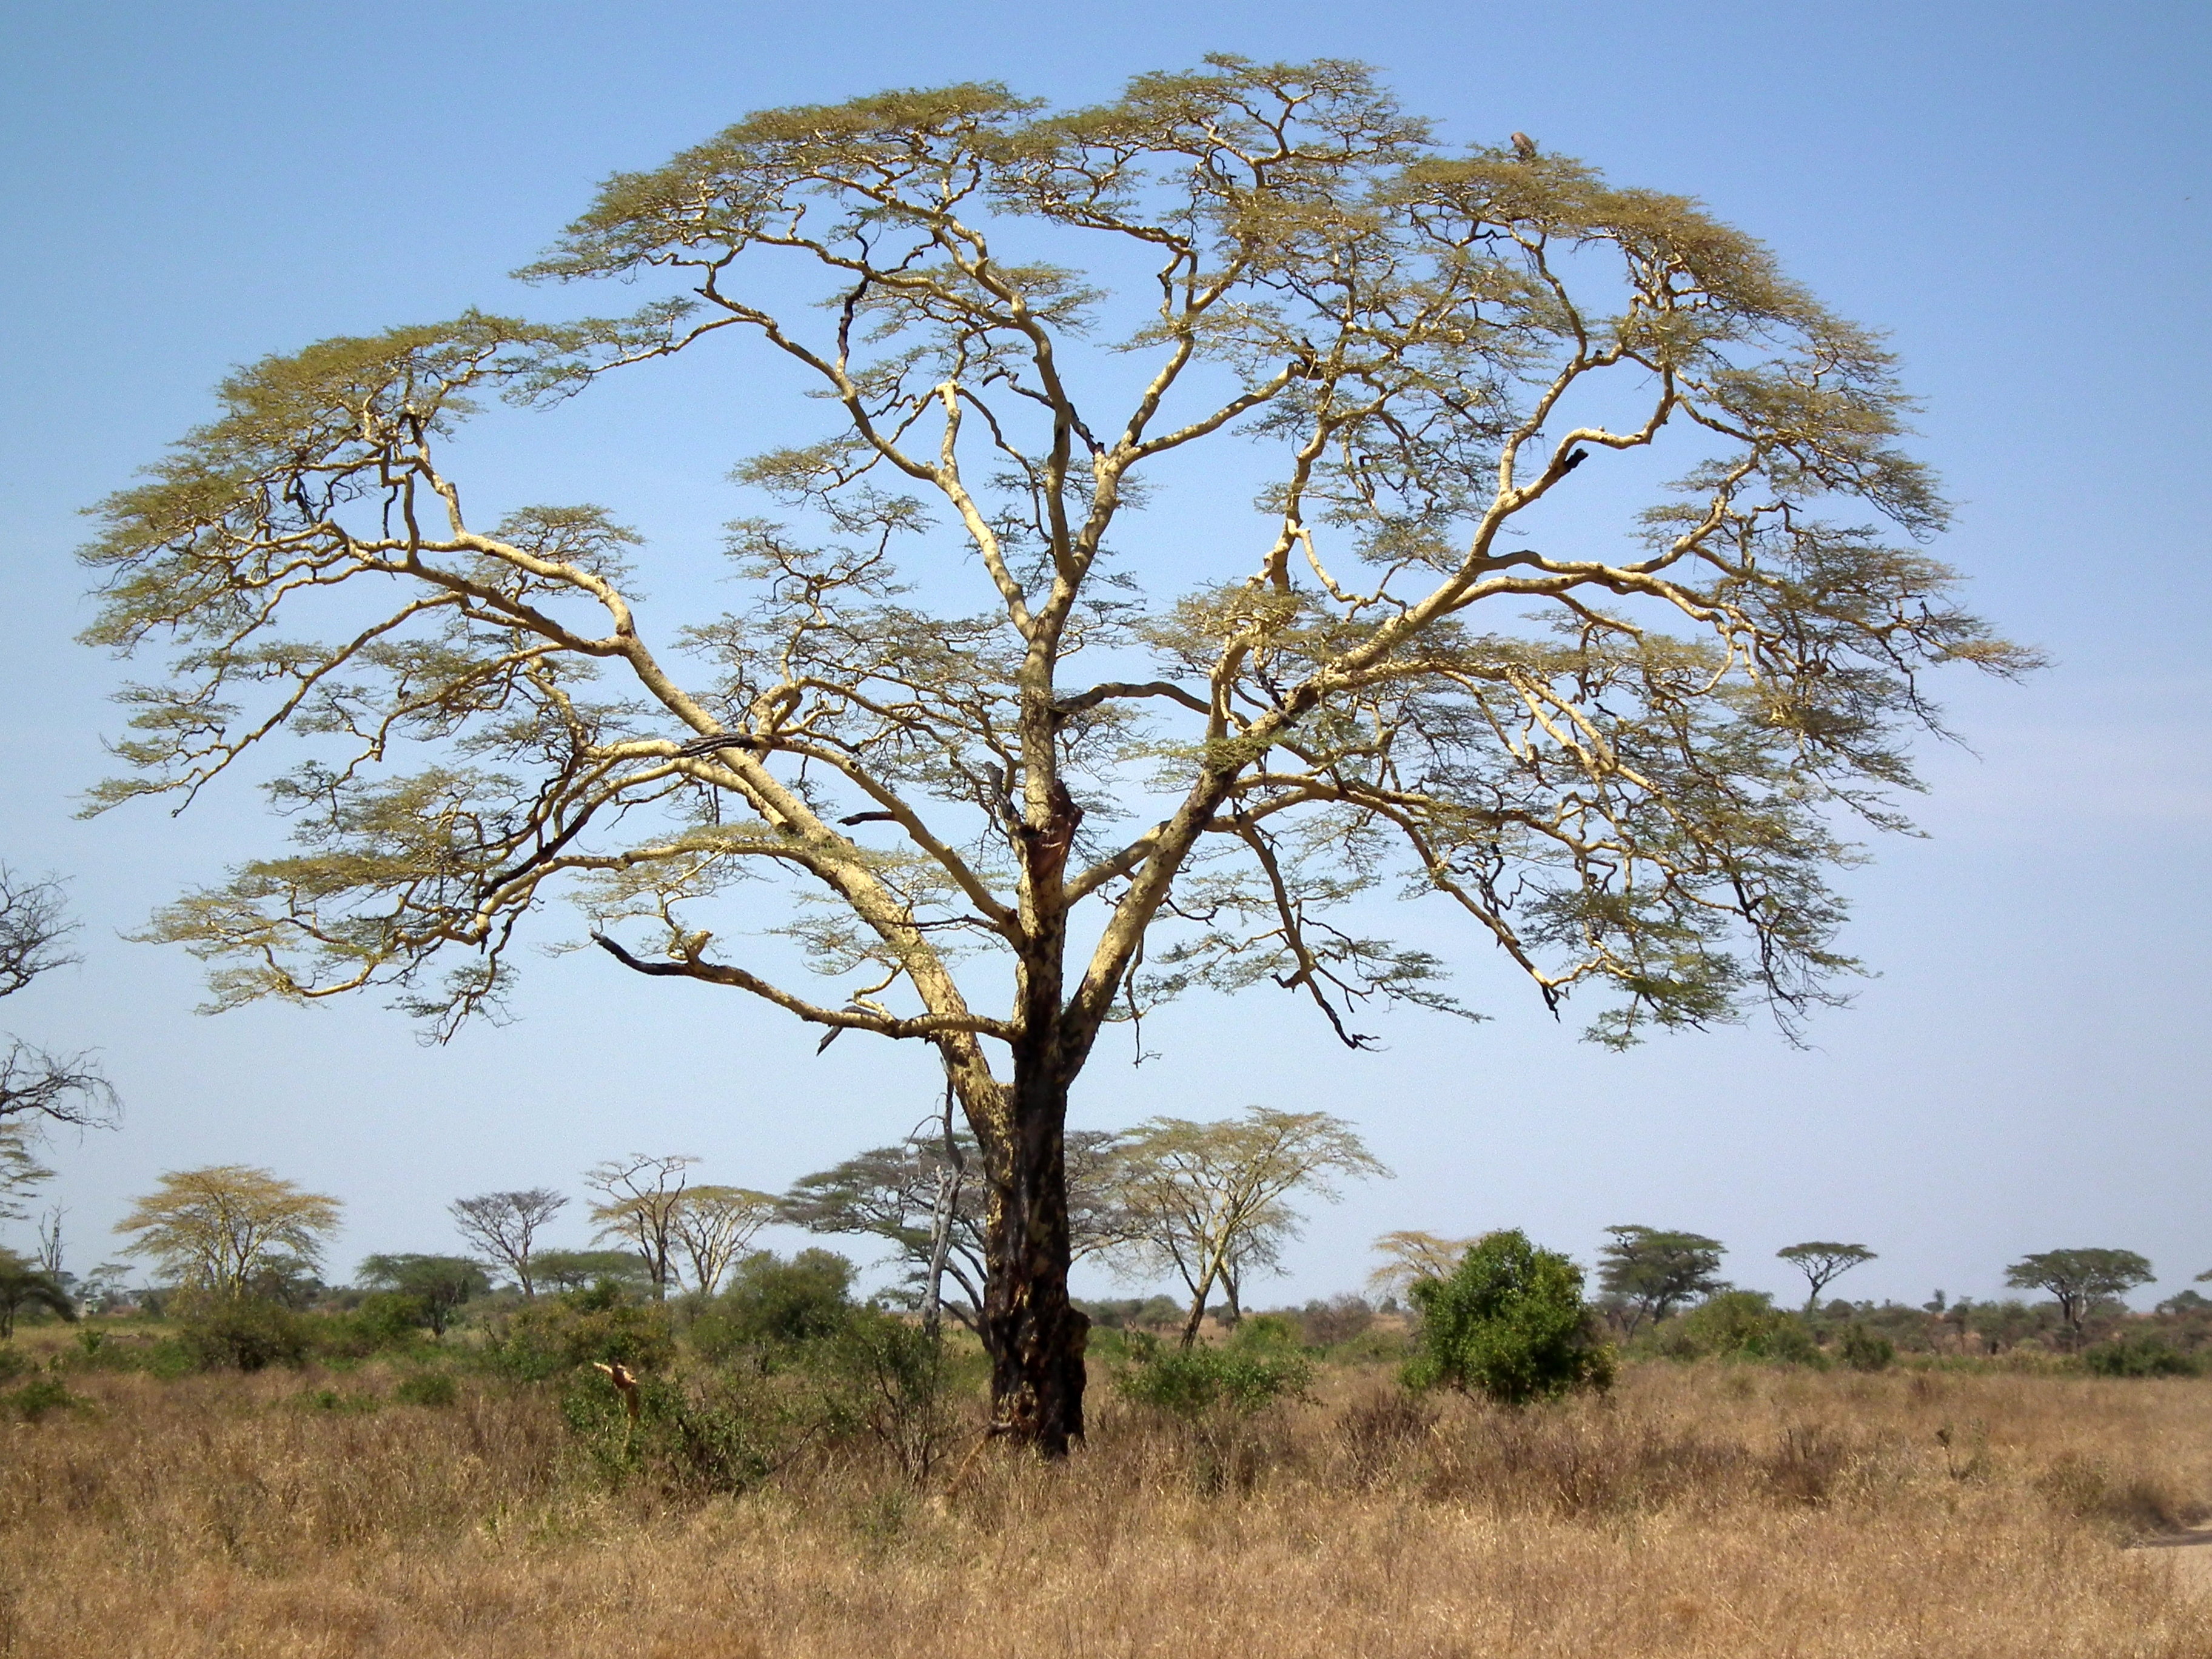 File:Acacia Xanthophloea Fever Tree In Tanzania 2873 Nevit.jpg